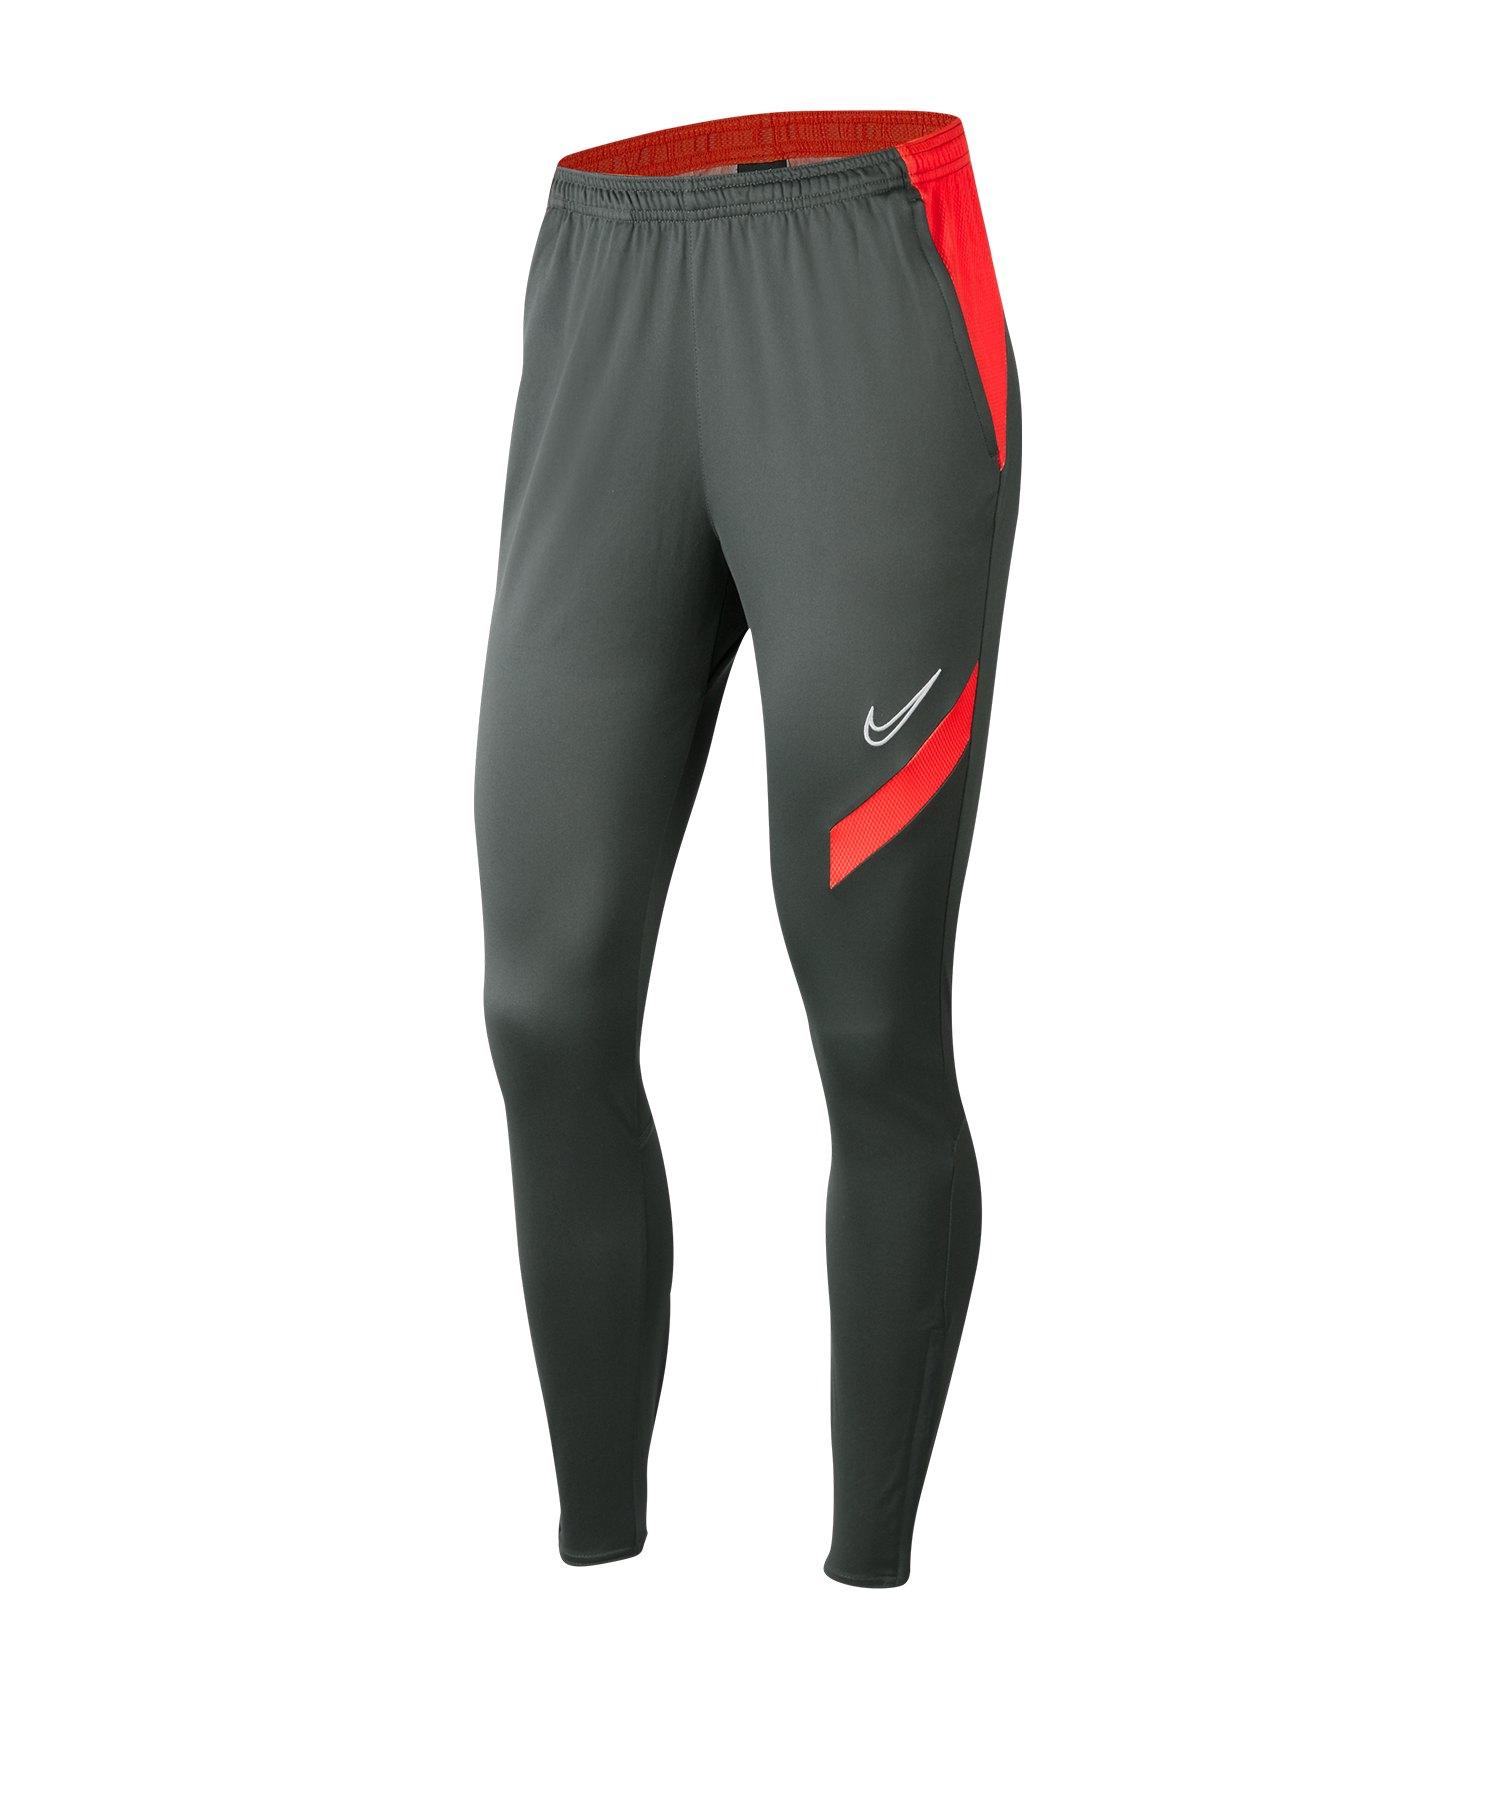 Nike Academy Pro Trainingshose Damen Grau Rot F067 - grau